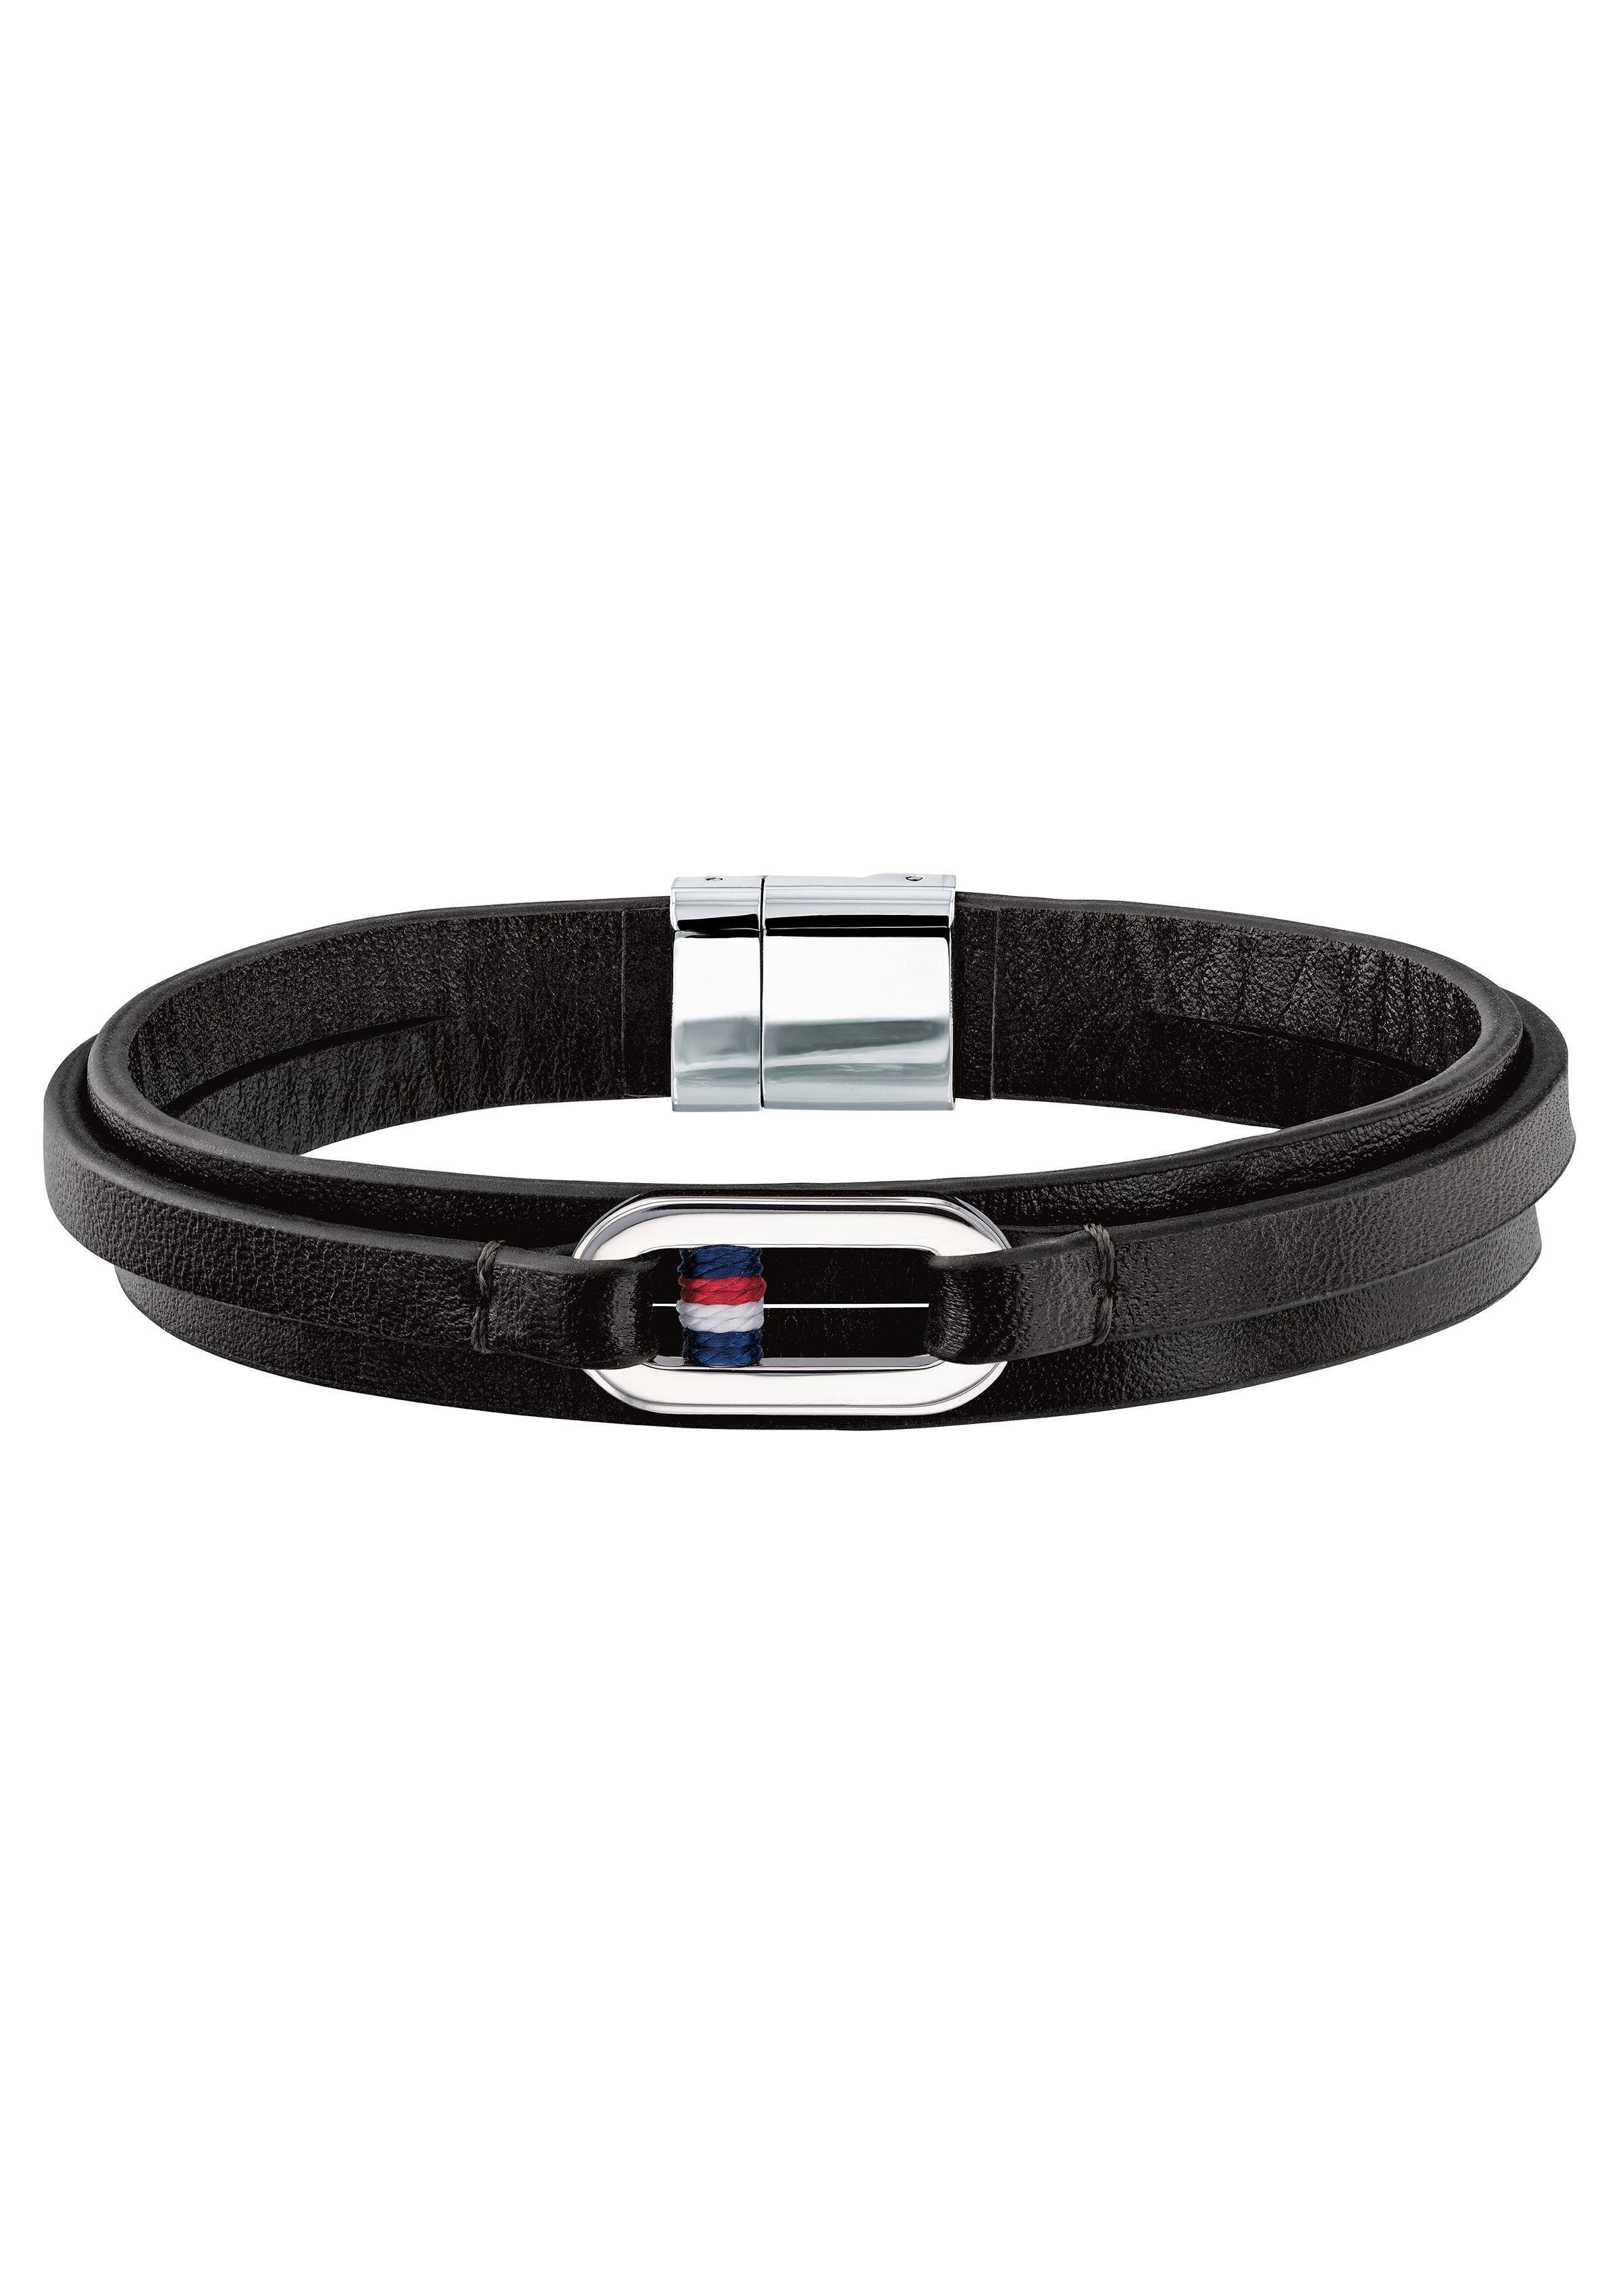 Tommy Hilfiger Armband Casual Core 2790028 Im Onlineshop I M Walking Fruhlingsschuhe Tommy Hilfiger Und Armband